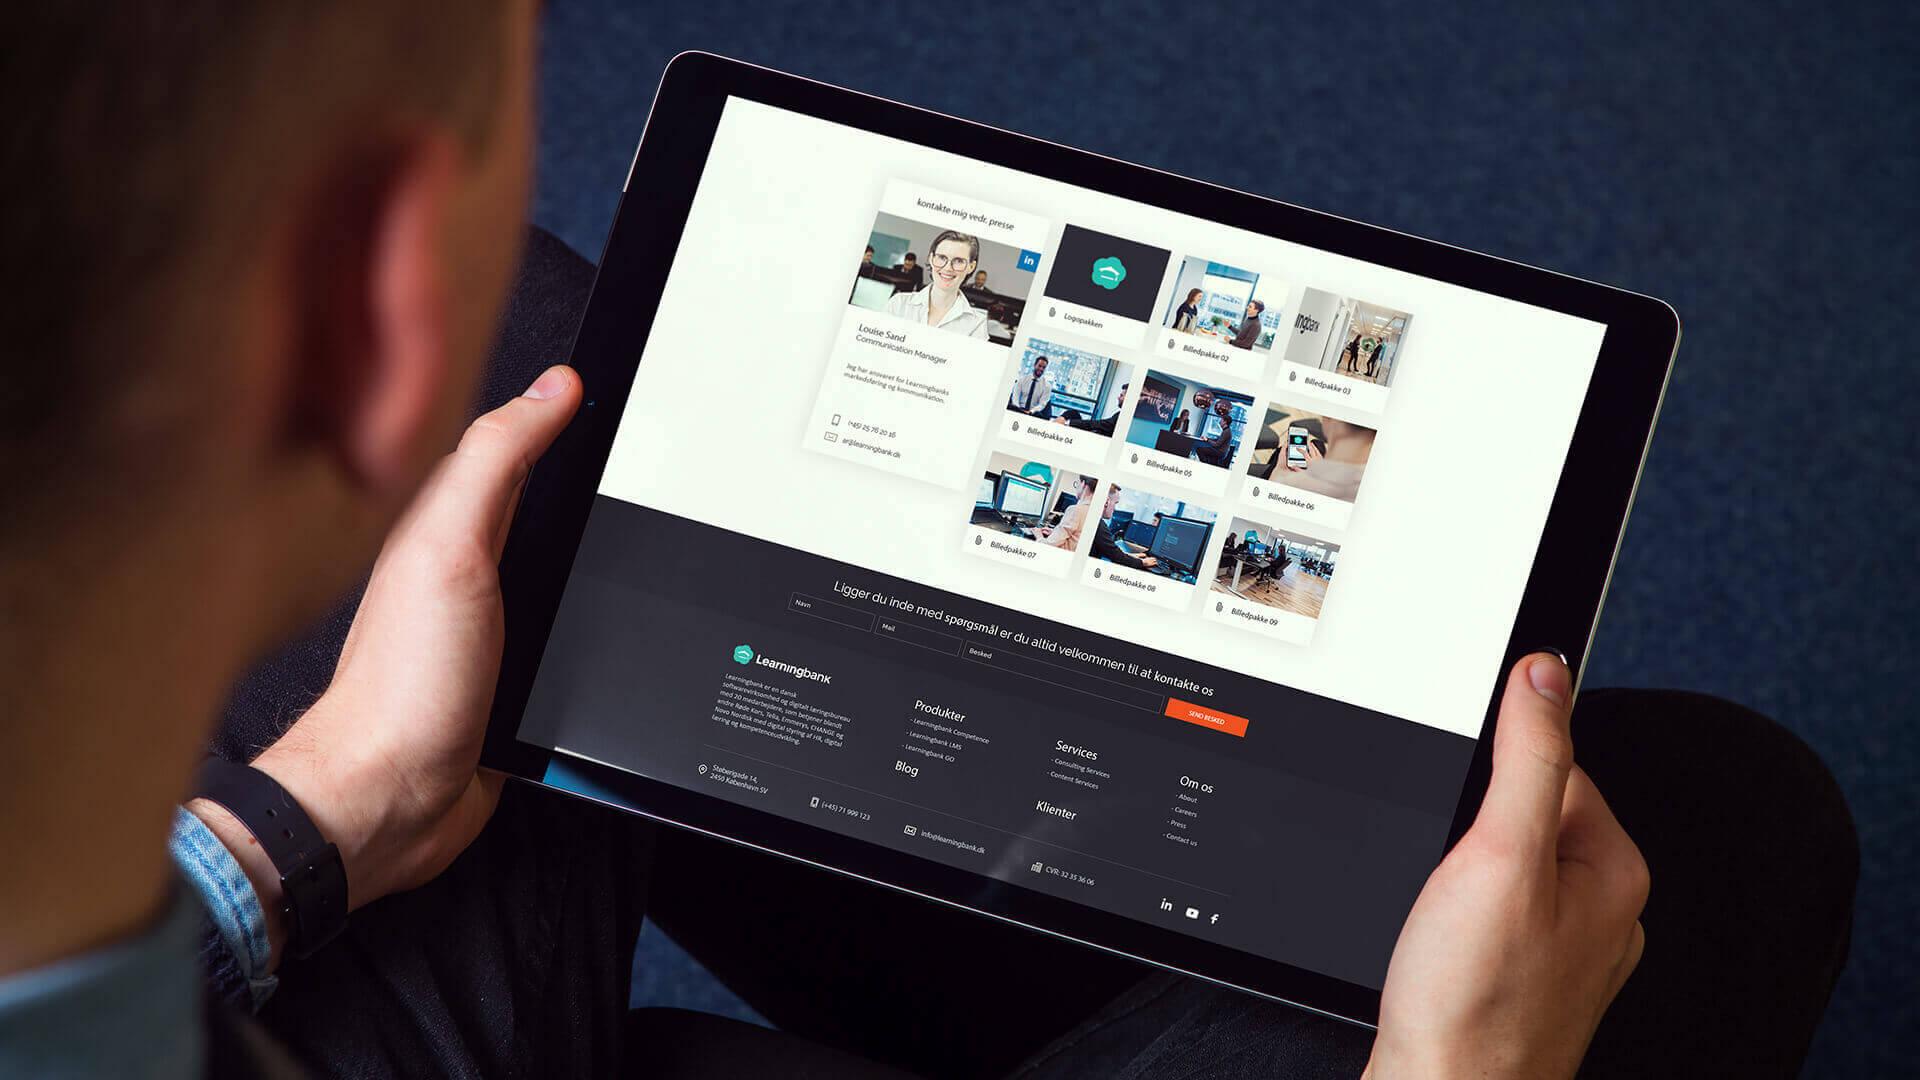 Learningbank præsentation på iPad